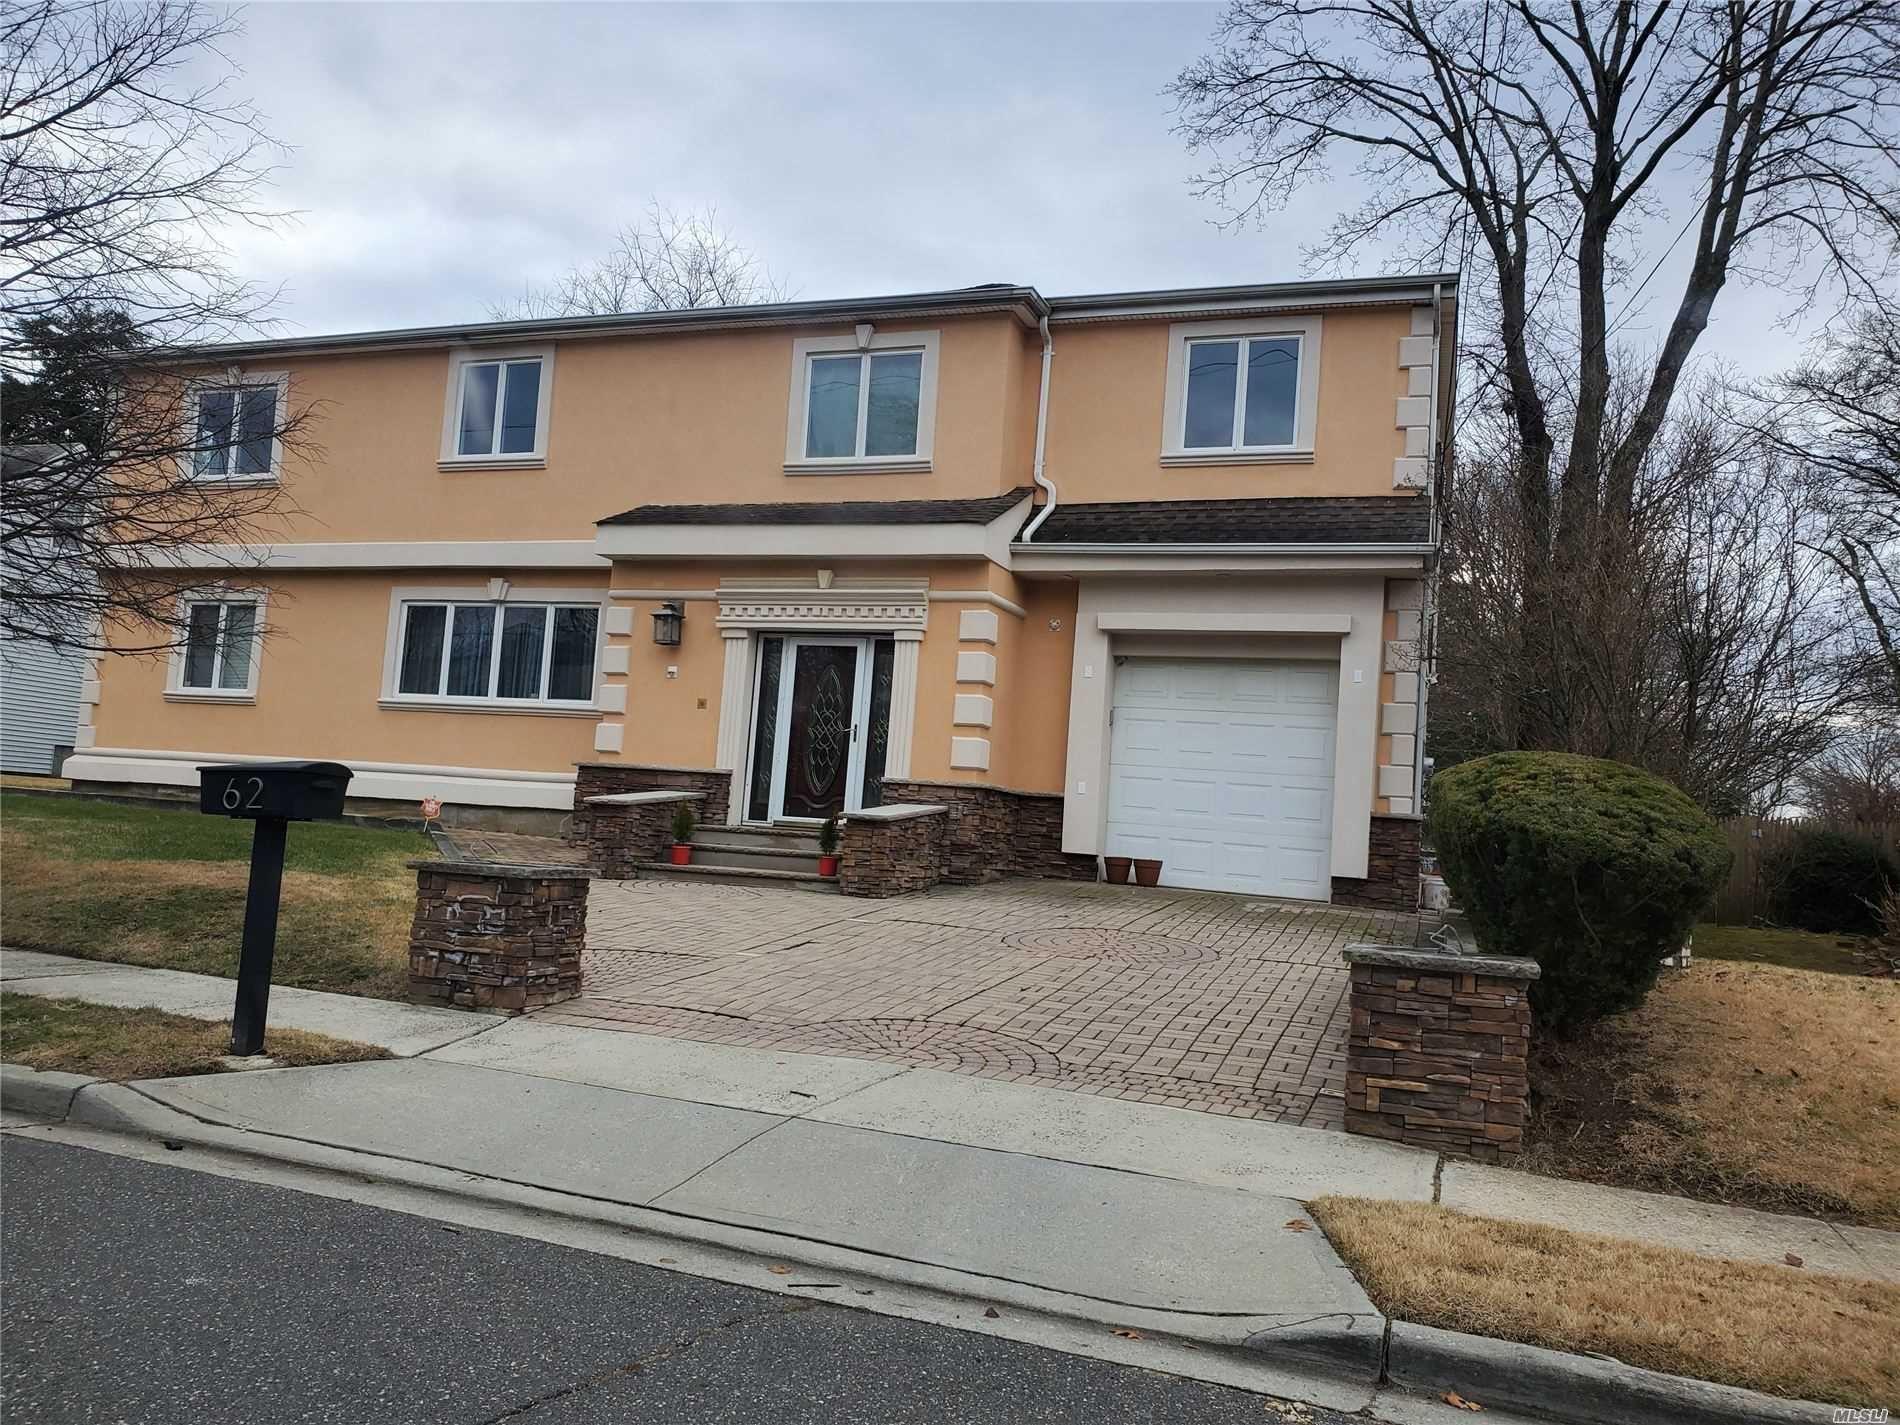 62 Melvin Avenue, West Hempstead, NY 11552 - MLS#: 3189213